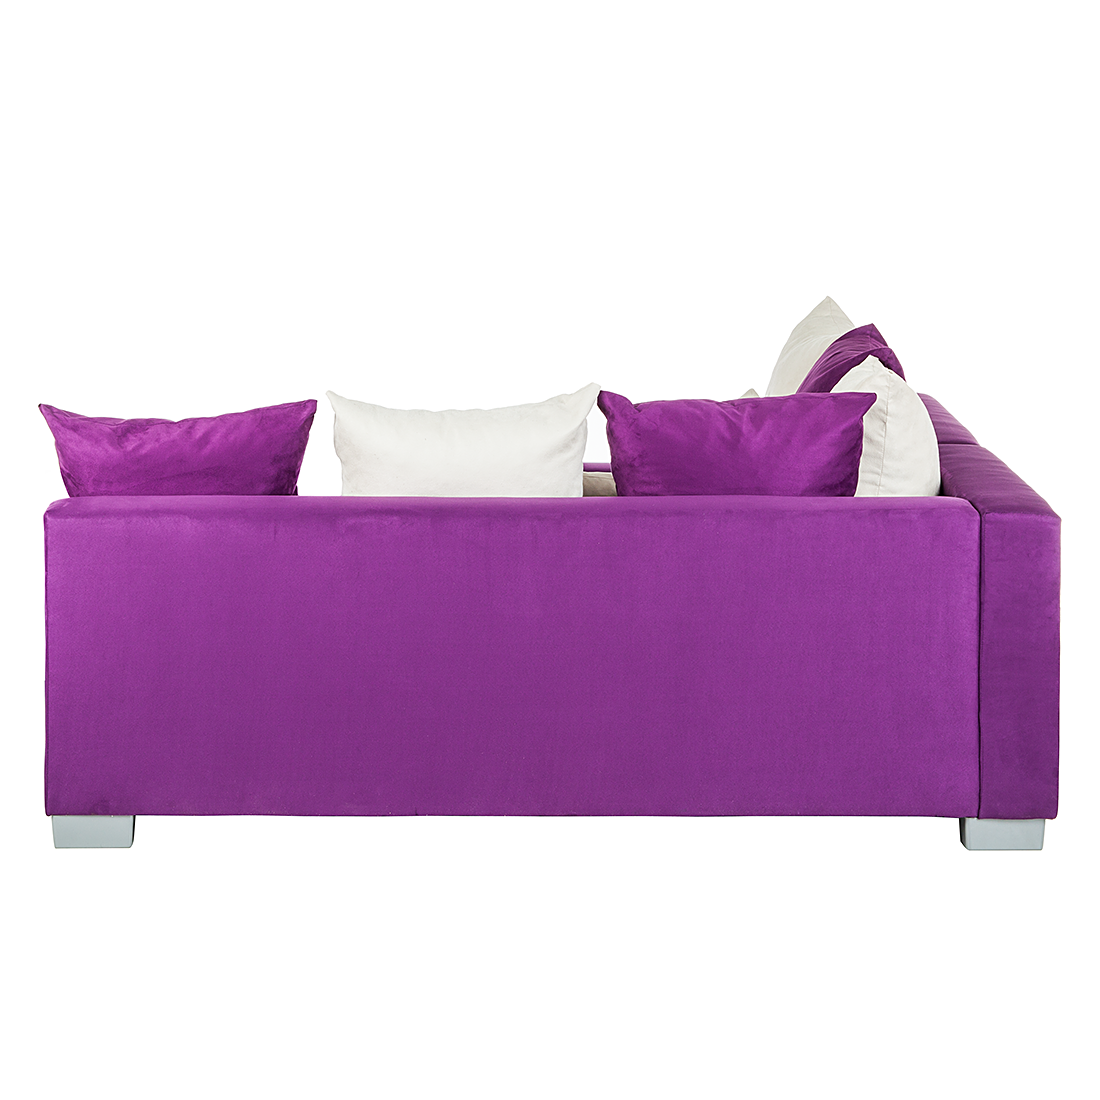 Ecksofa Stoff Lila 3Sitzer Sofa Couch Eckcouch  -> Ecksofa Venus